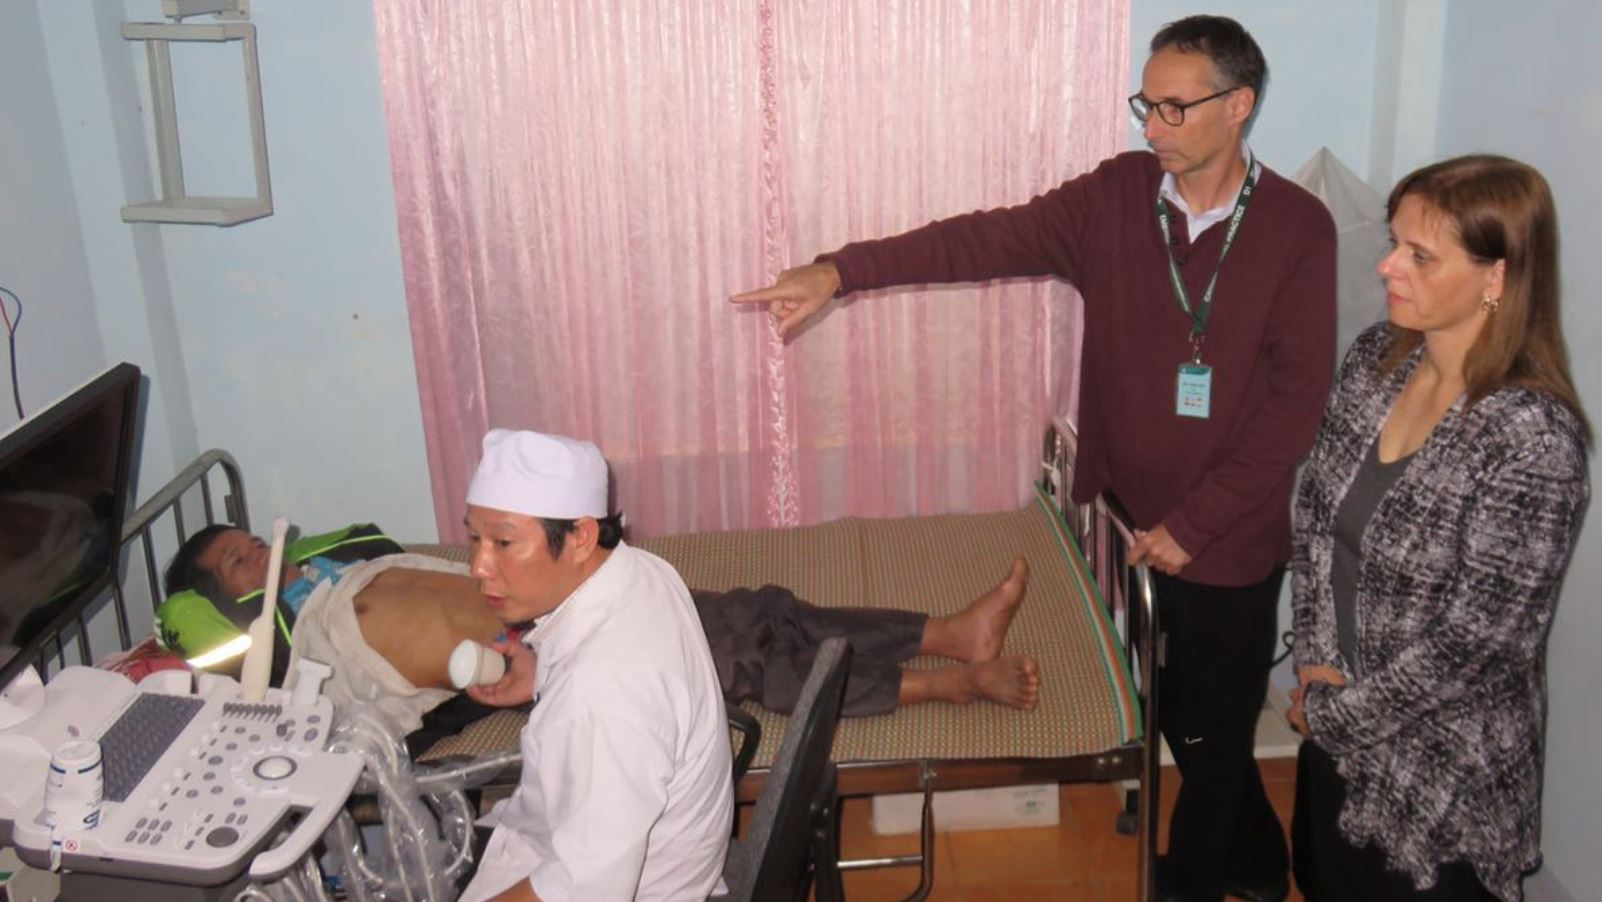 Dr. Rafi Kot and Israeli Ambassador Meirav Eilon Shahar at the Vietnamese hospital where Kot donated a new ultrasound machine. Photo courtesy of Israeli Embassy in Vietnam